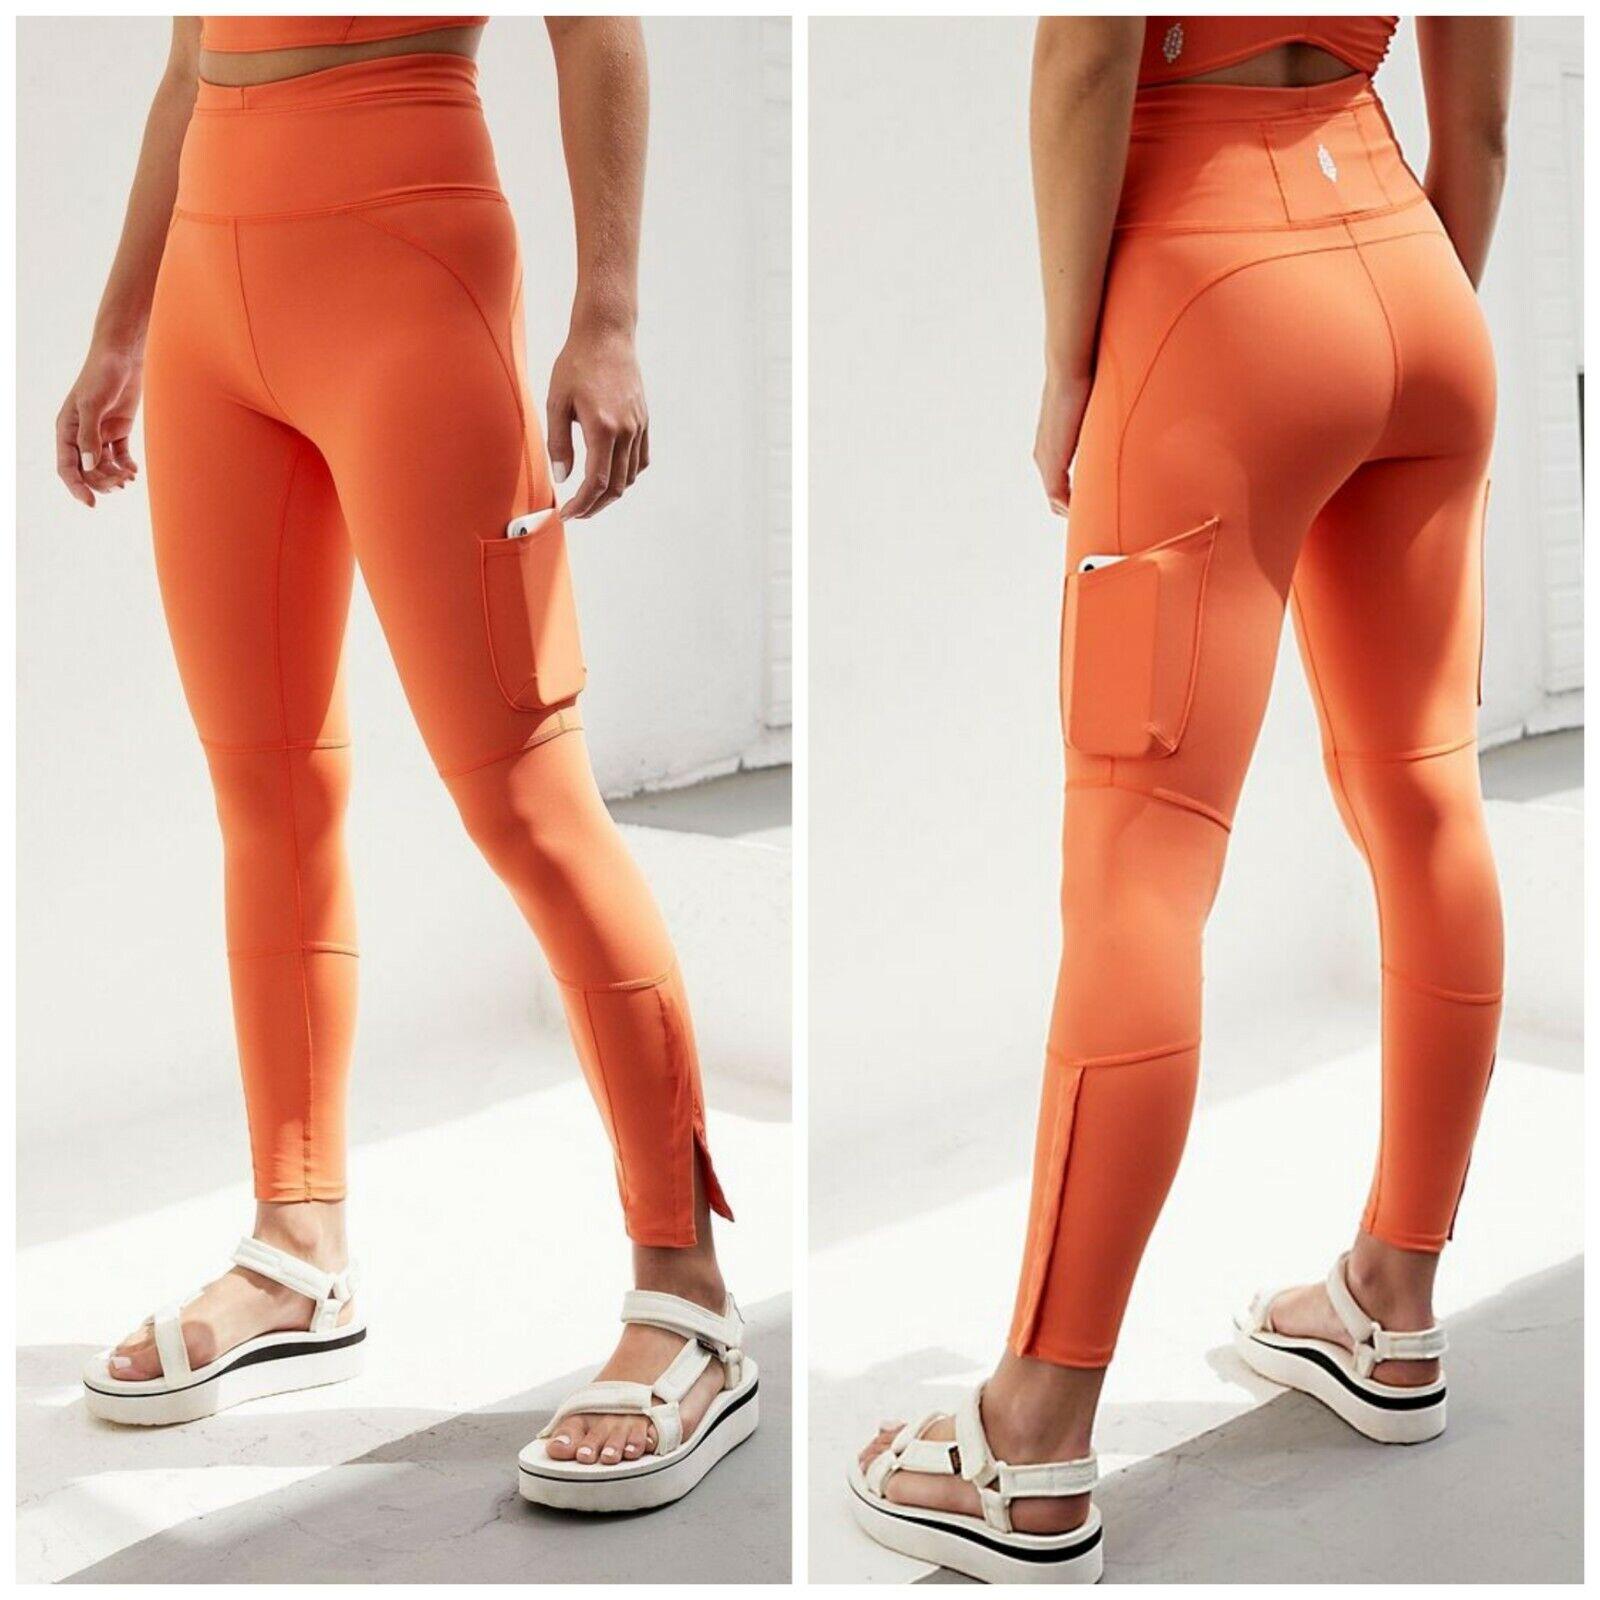 Free People Movement Orange High Rise Ankle Length Flex It Leggings Size Small